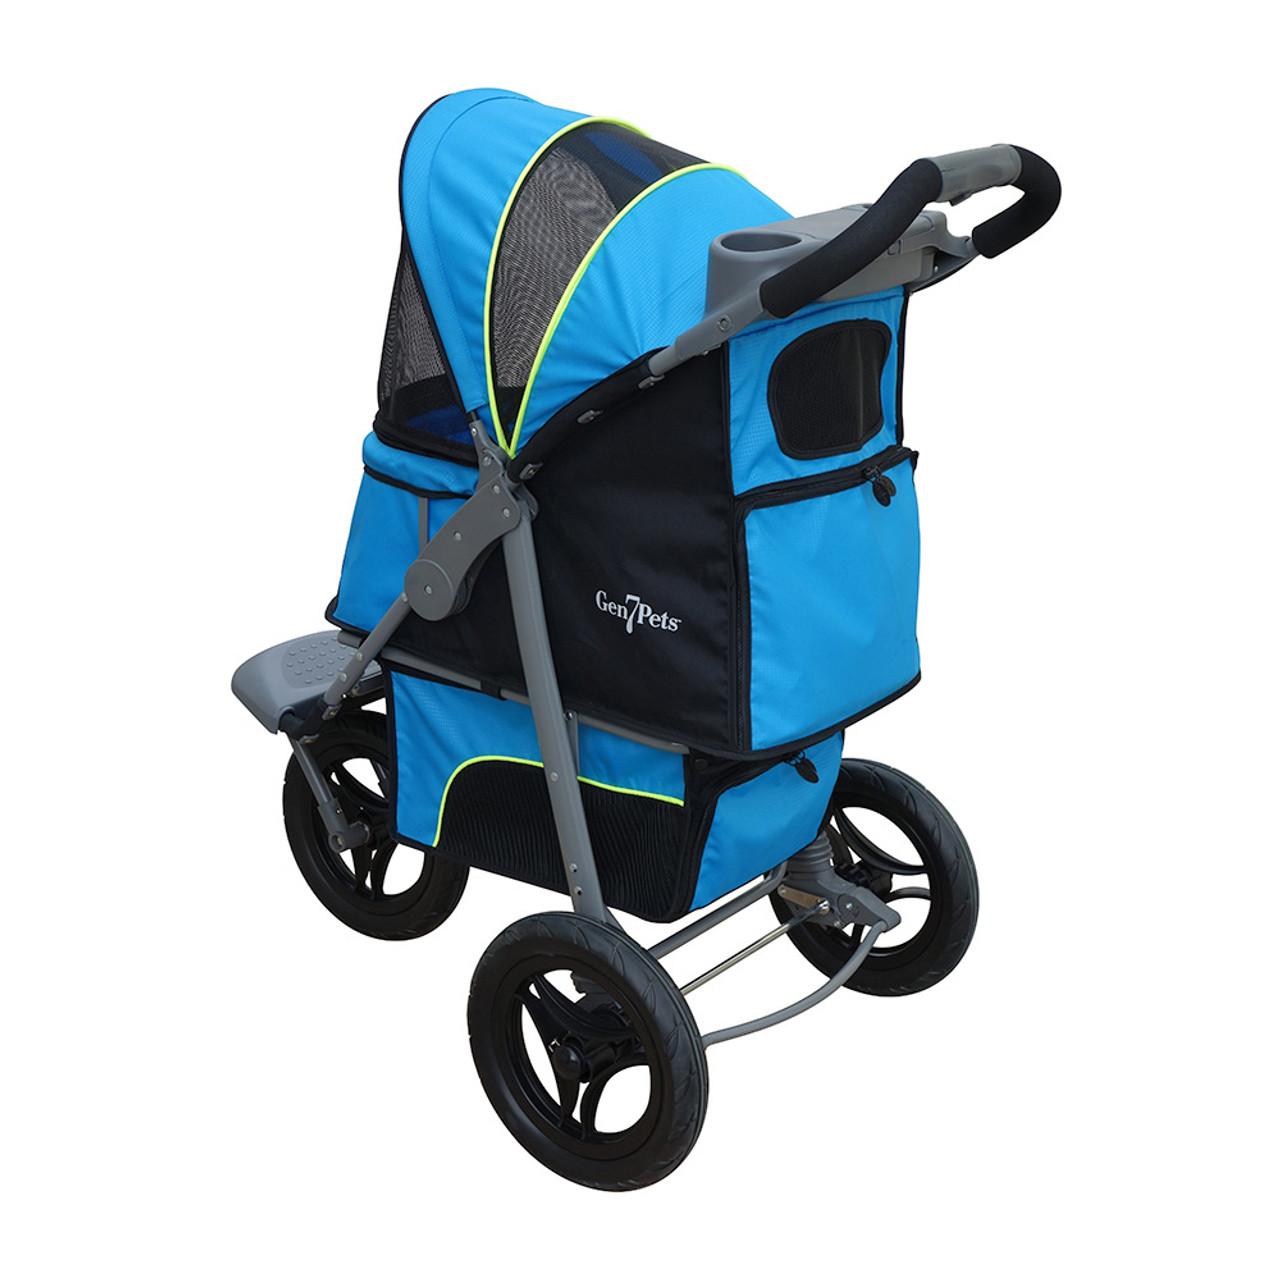 Gen7Pets Jogger Pet Stroller